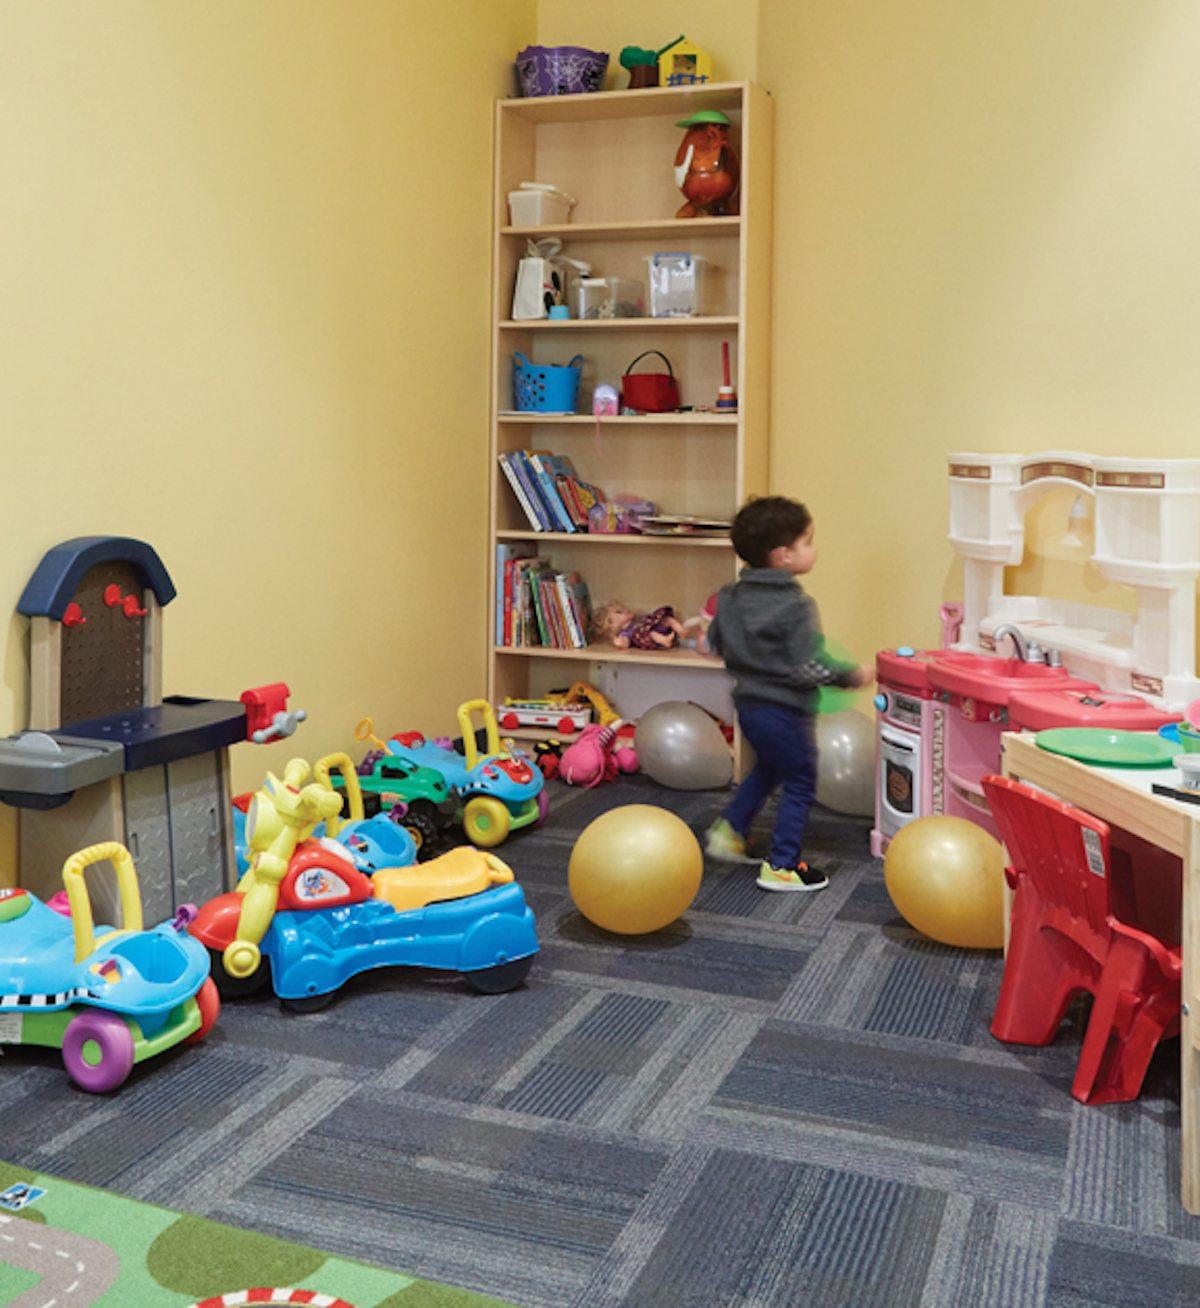 dua-playroom-lounge